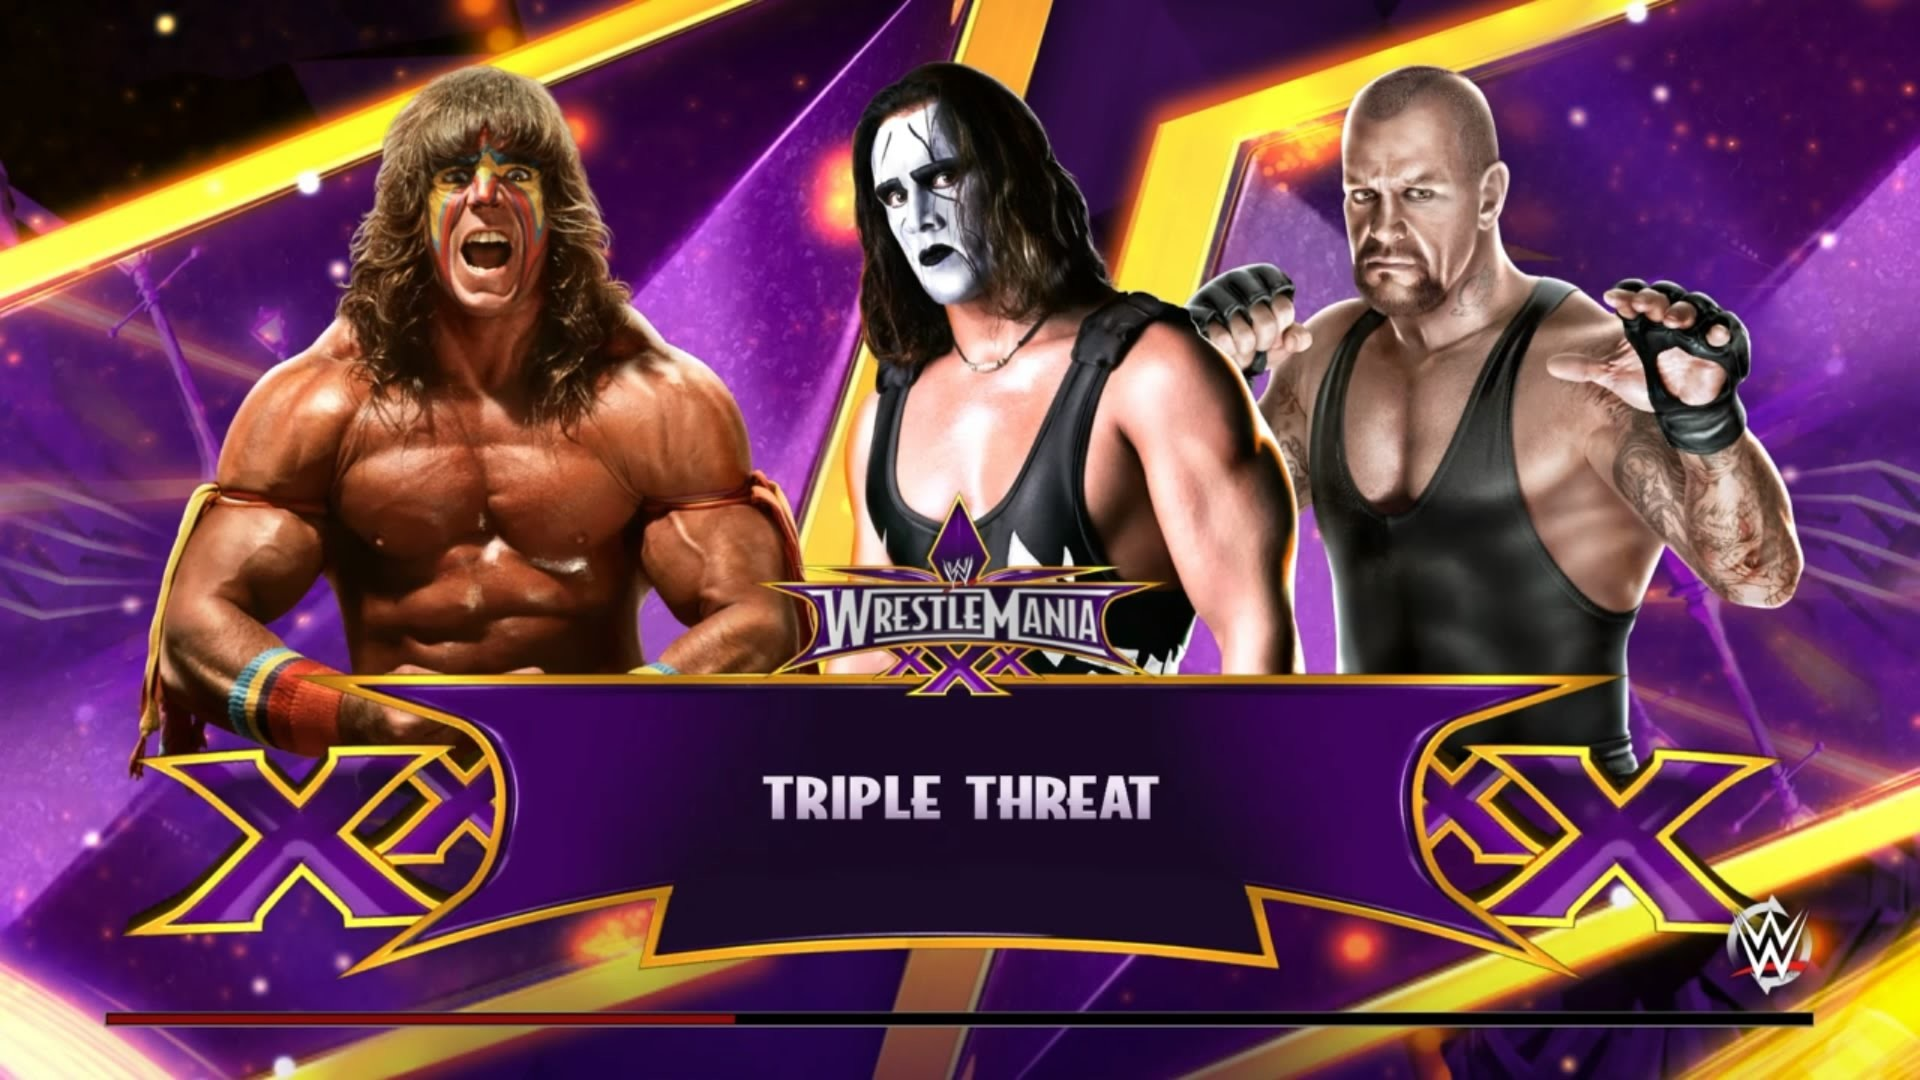 Sting vs Ultimate Warrior vs Undertaker Wrestlemania Triple Threat! – WWE  2K15 – YouTube